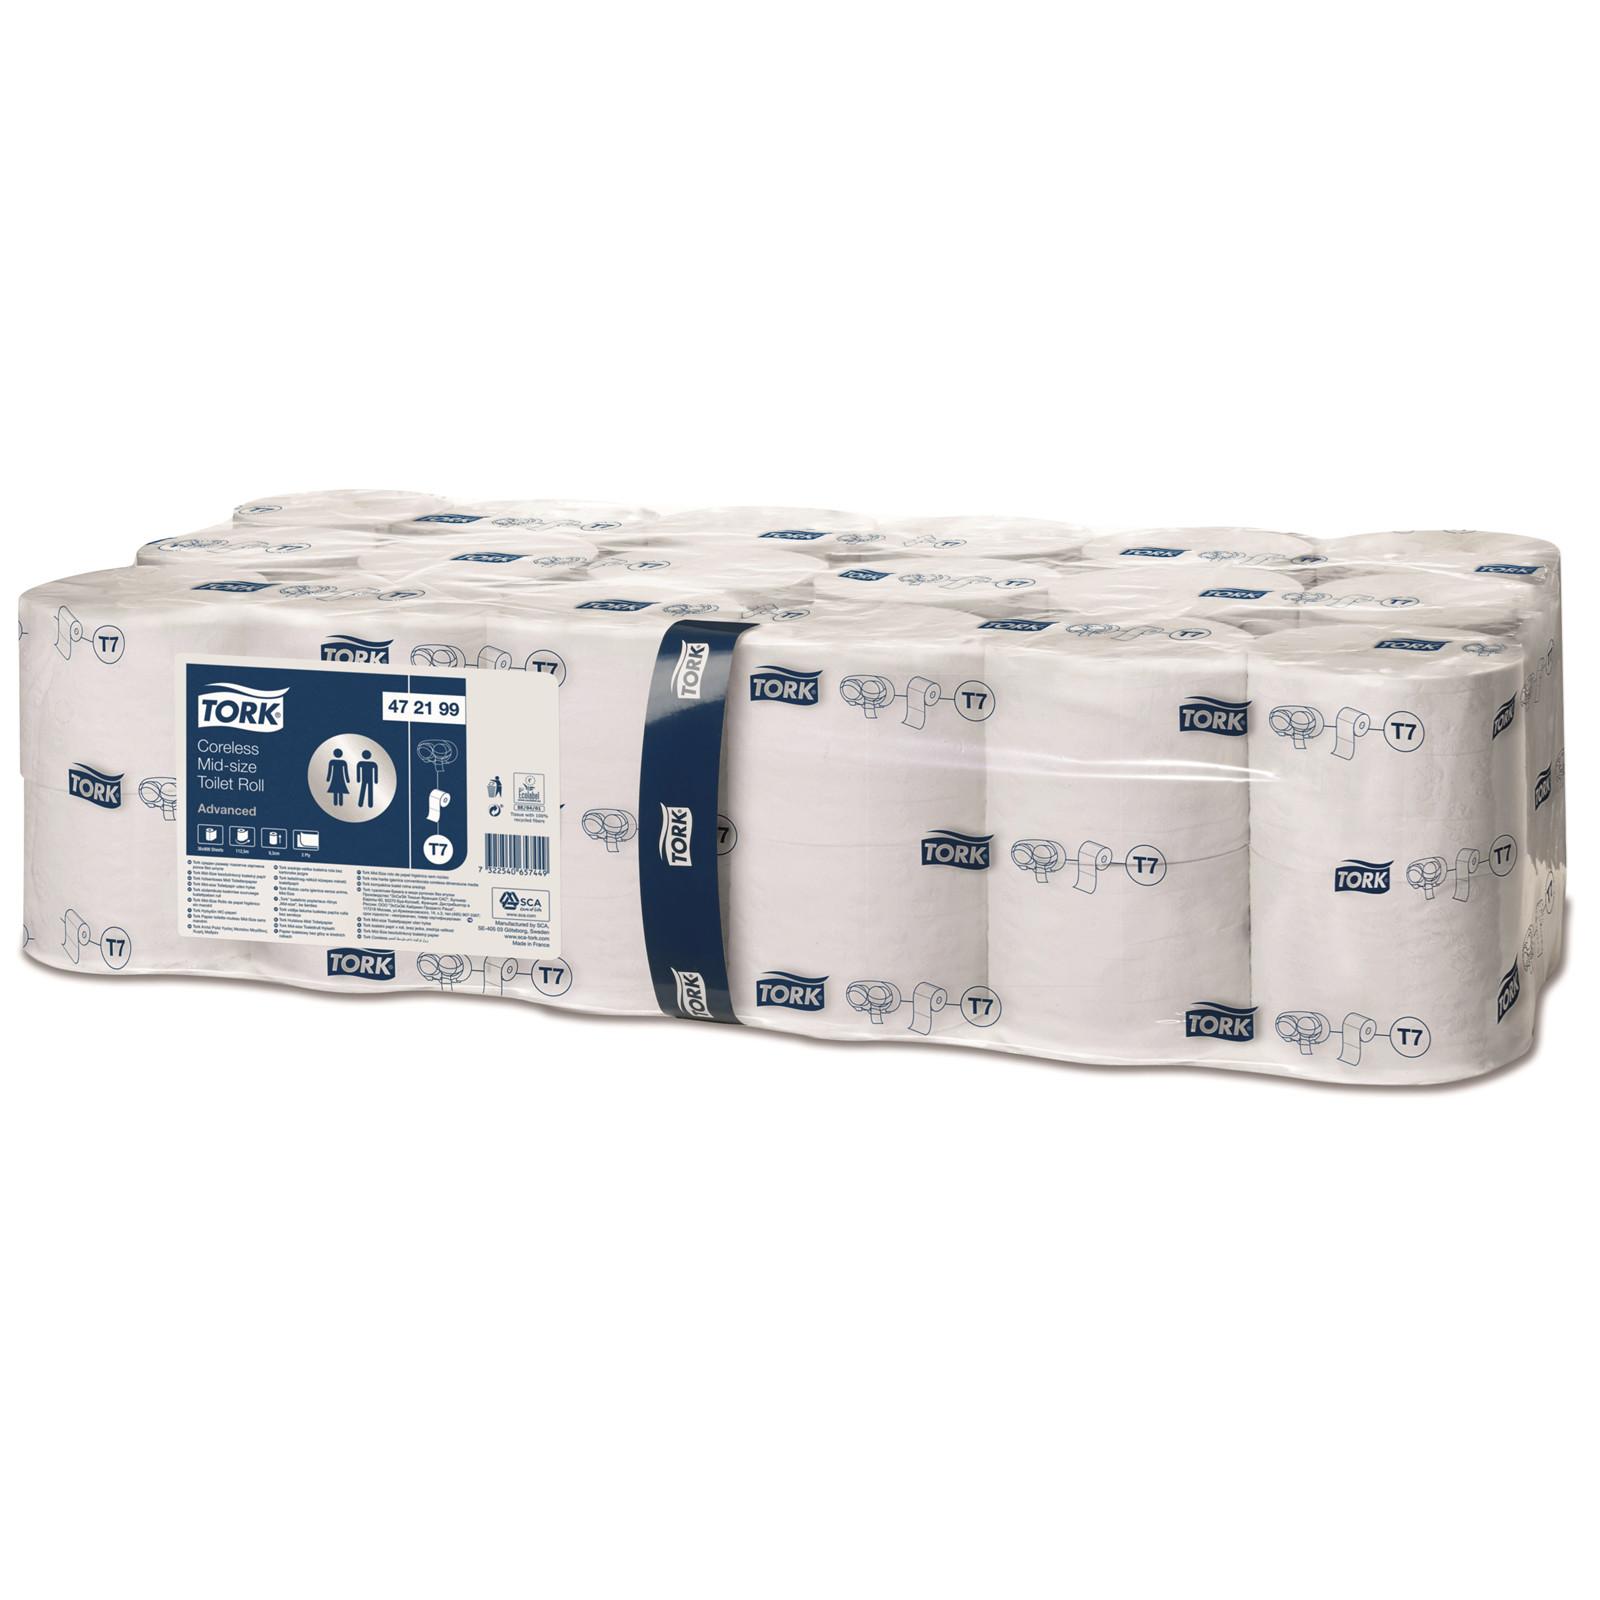 Tork 472199 Mid-size Toiletpapir Advanced uden hylse - 36 toiletruller